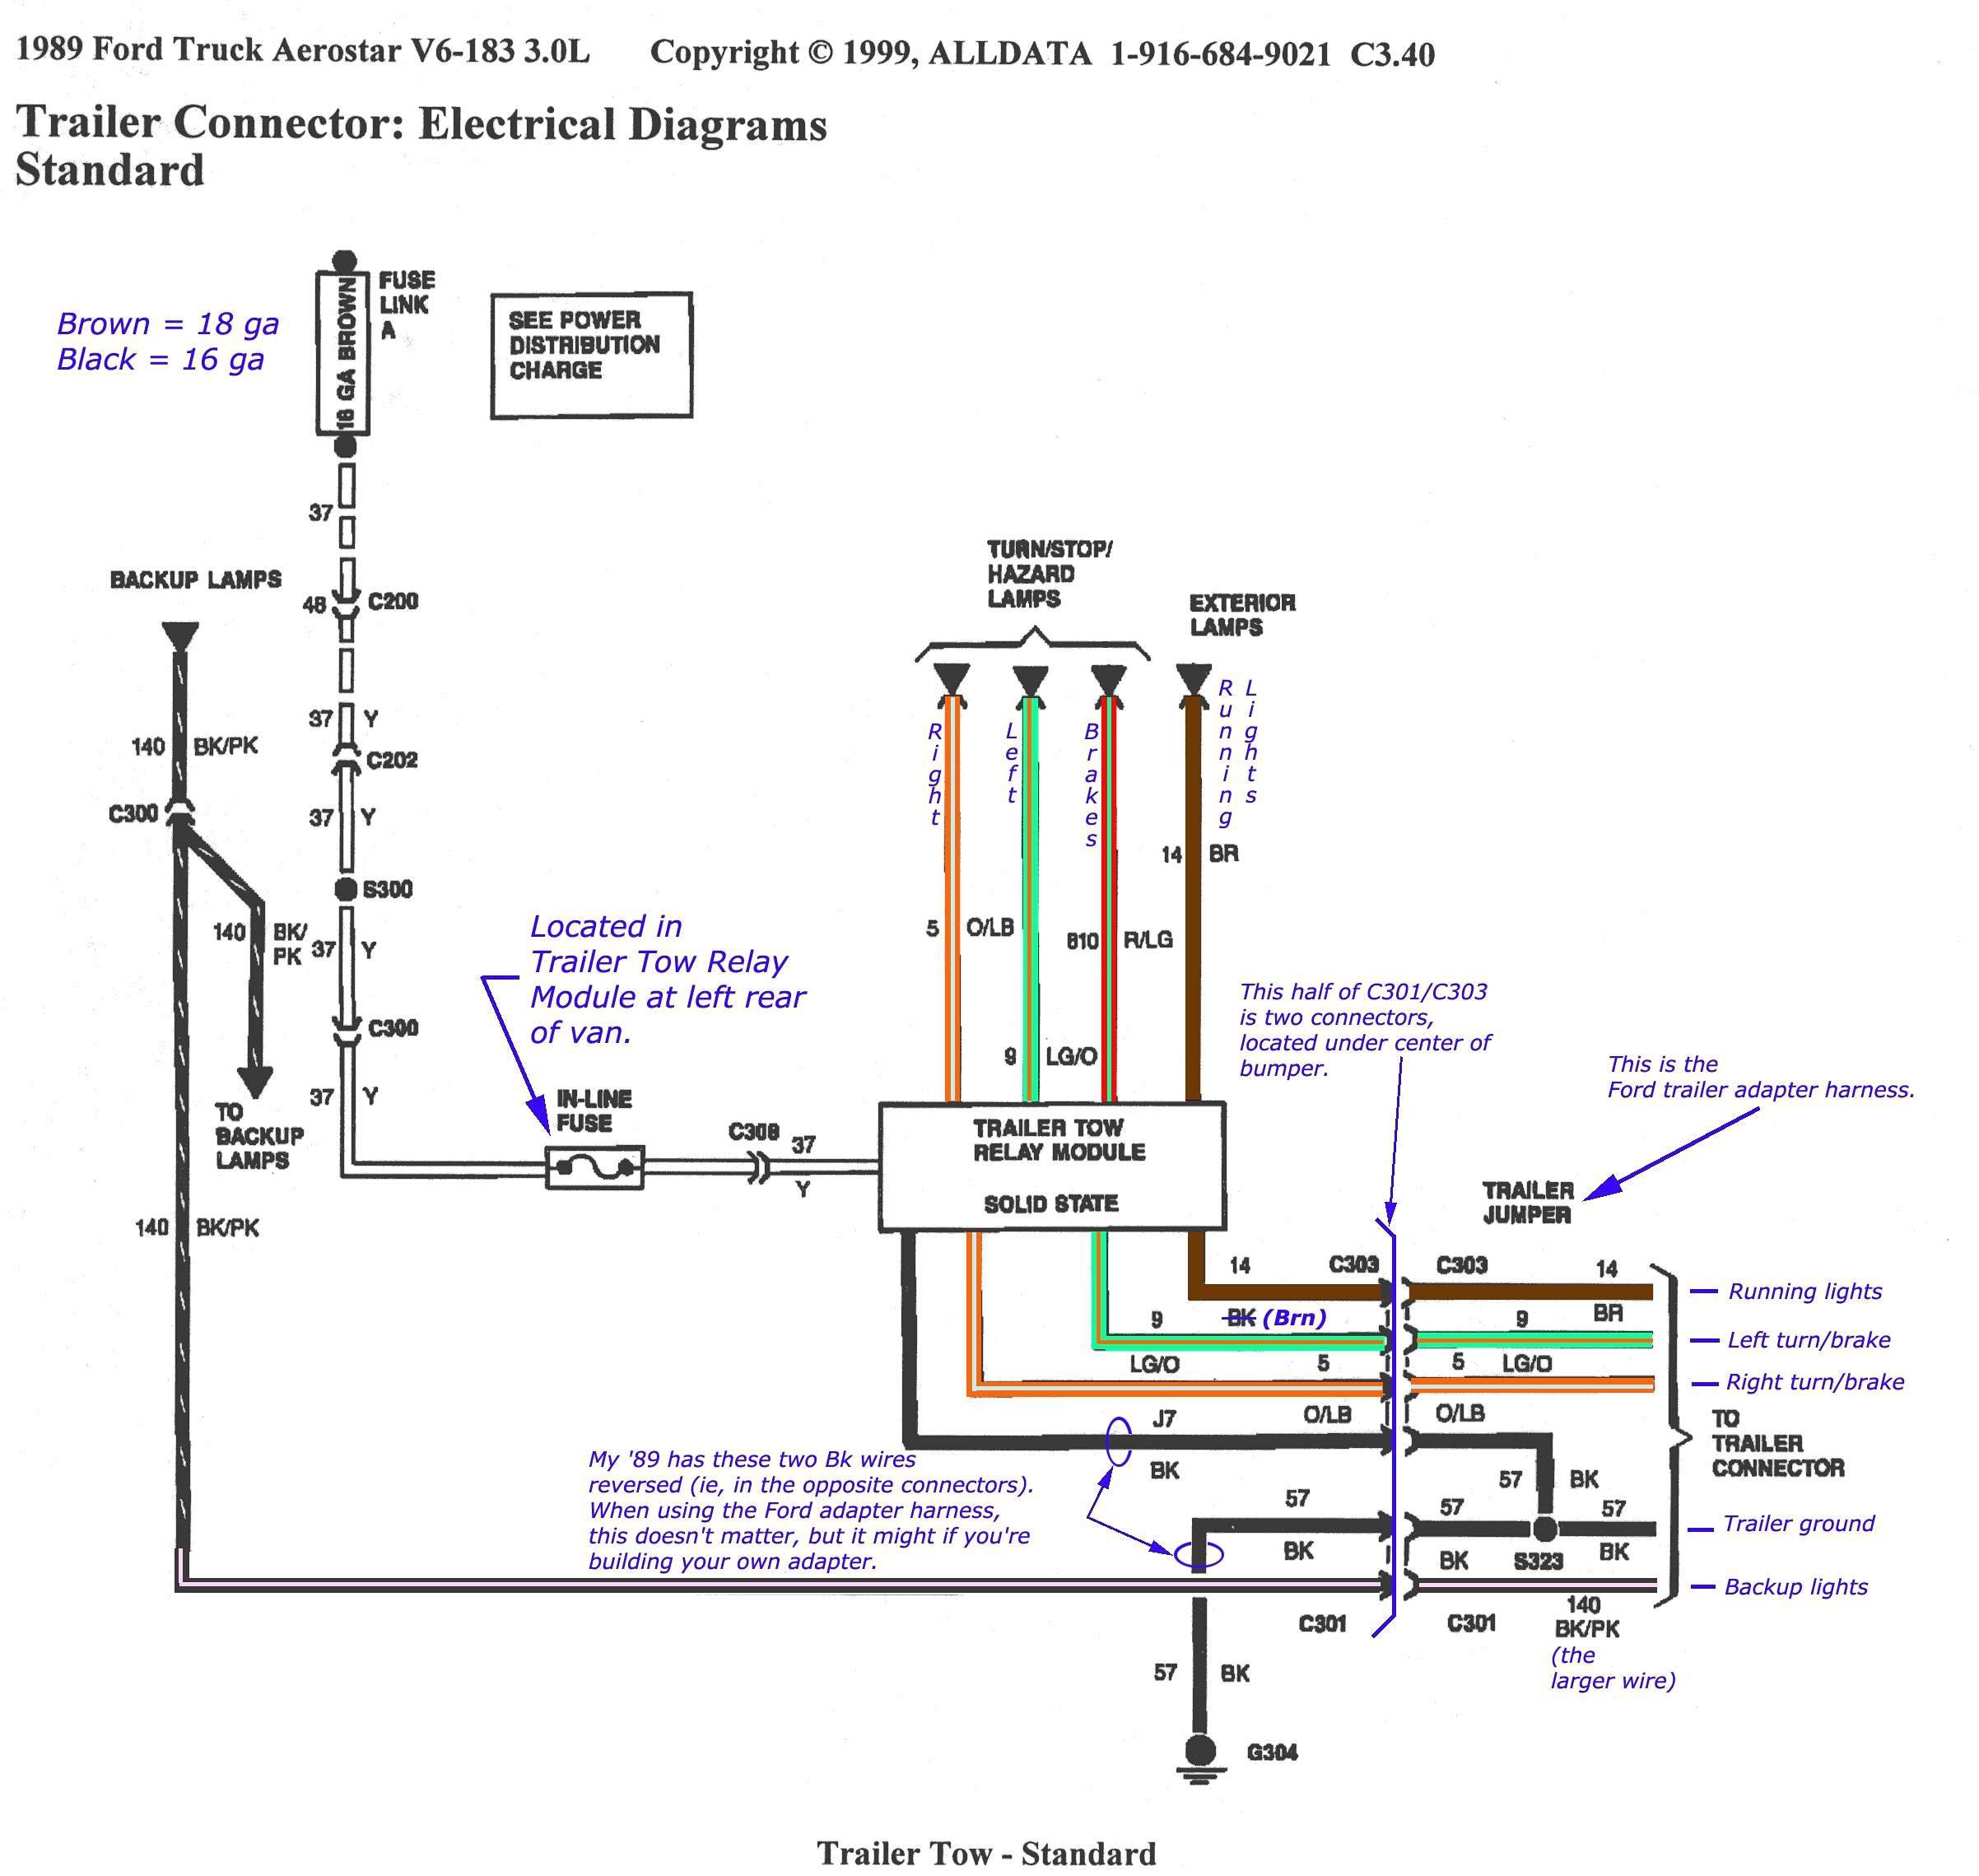 Ford Hitch Wiring Diagram | Manual E-Books - Trailer Hitch Wiring Diagram